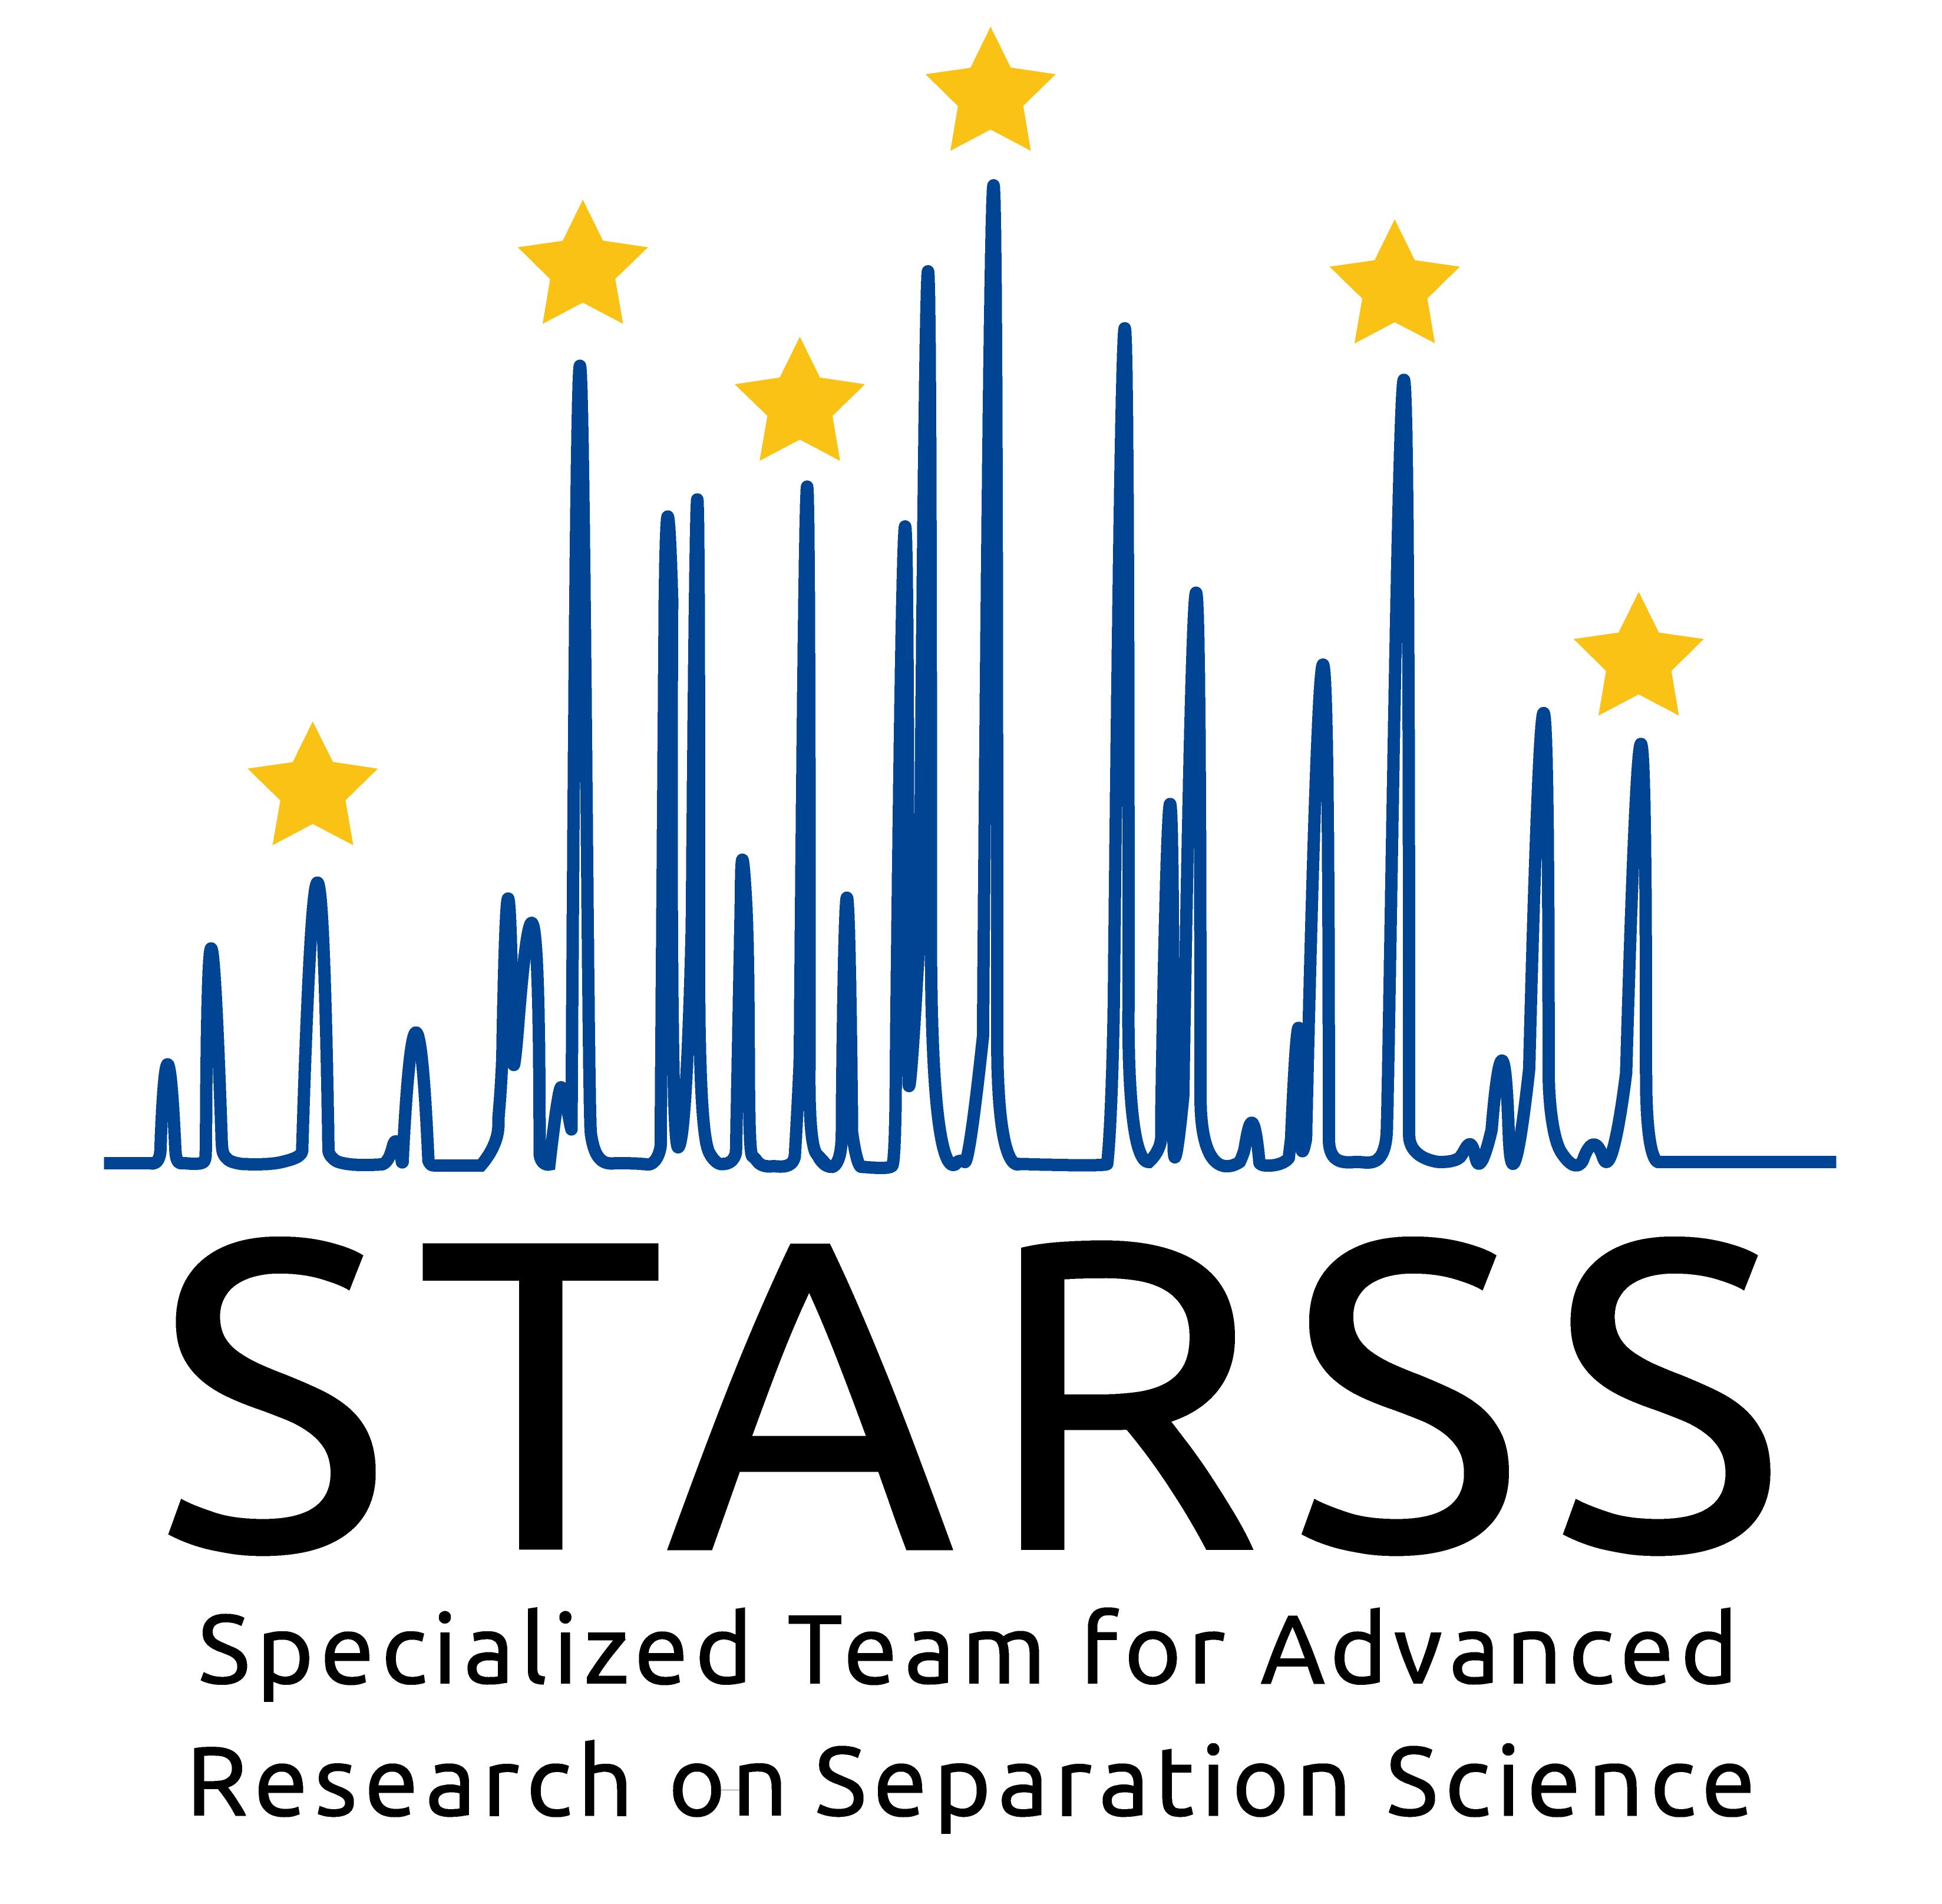 Starss logo